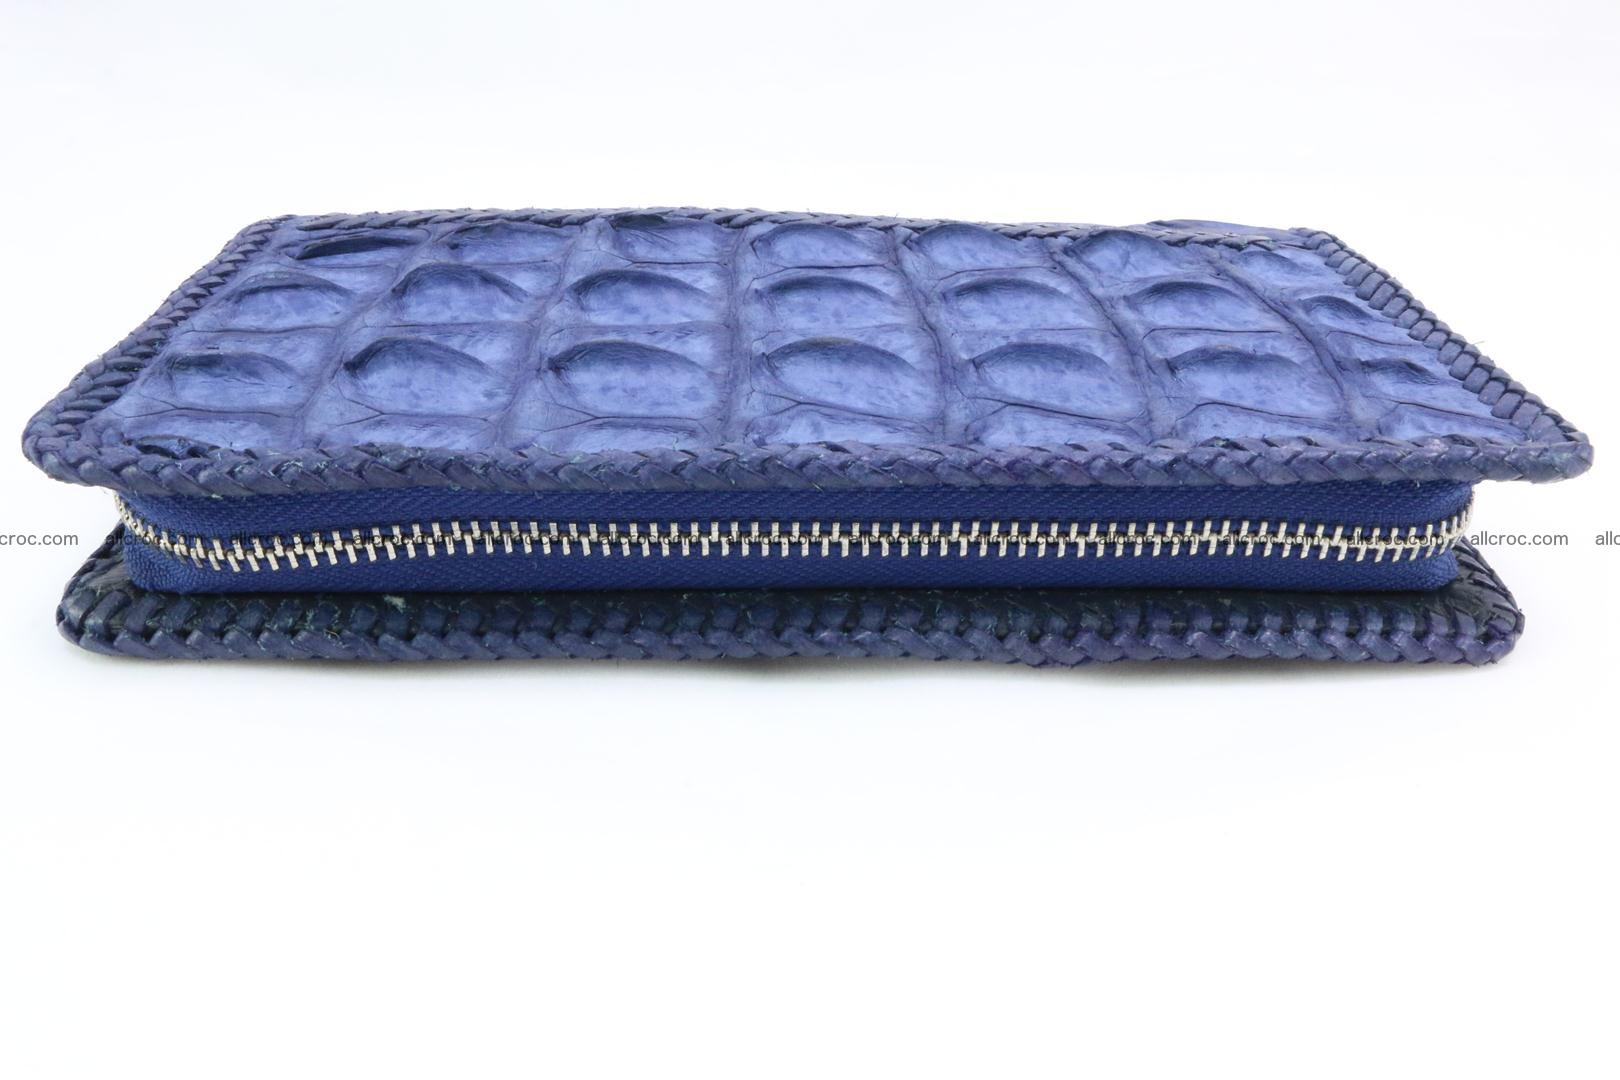 Genuine crocodile hornback wallet with zip 101 Foto 8